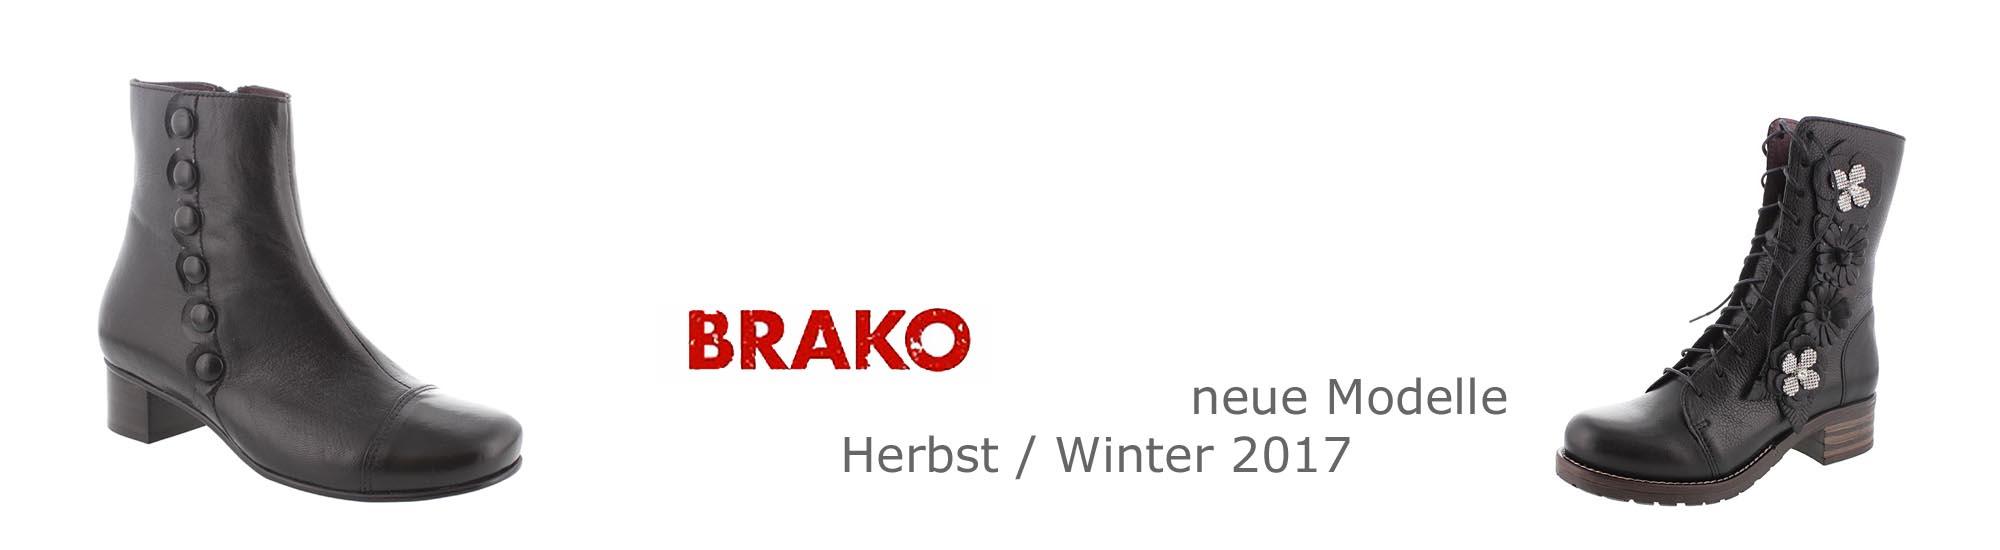 neue Brako Schuhe Herbnst Winter 2017